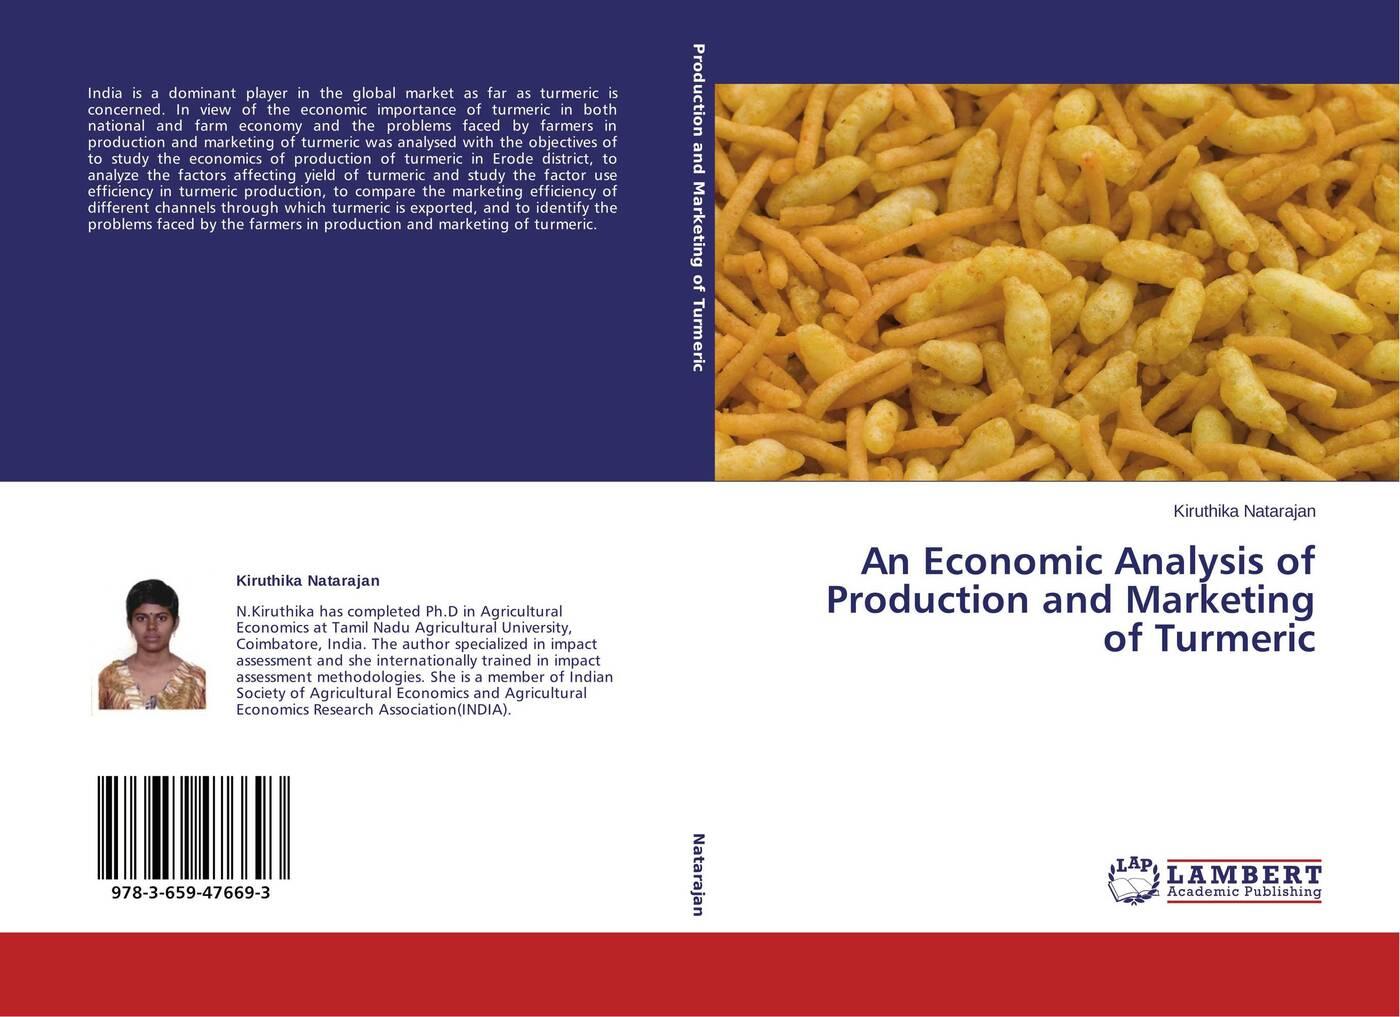 Kiruthika Natarajan An Economic Analysis of Production and Marketing of Turmeric цена в Москве и Питере